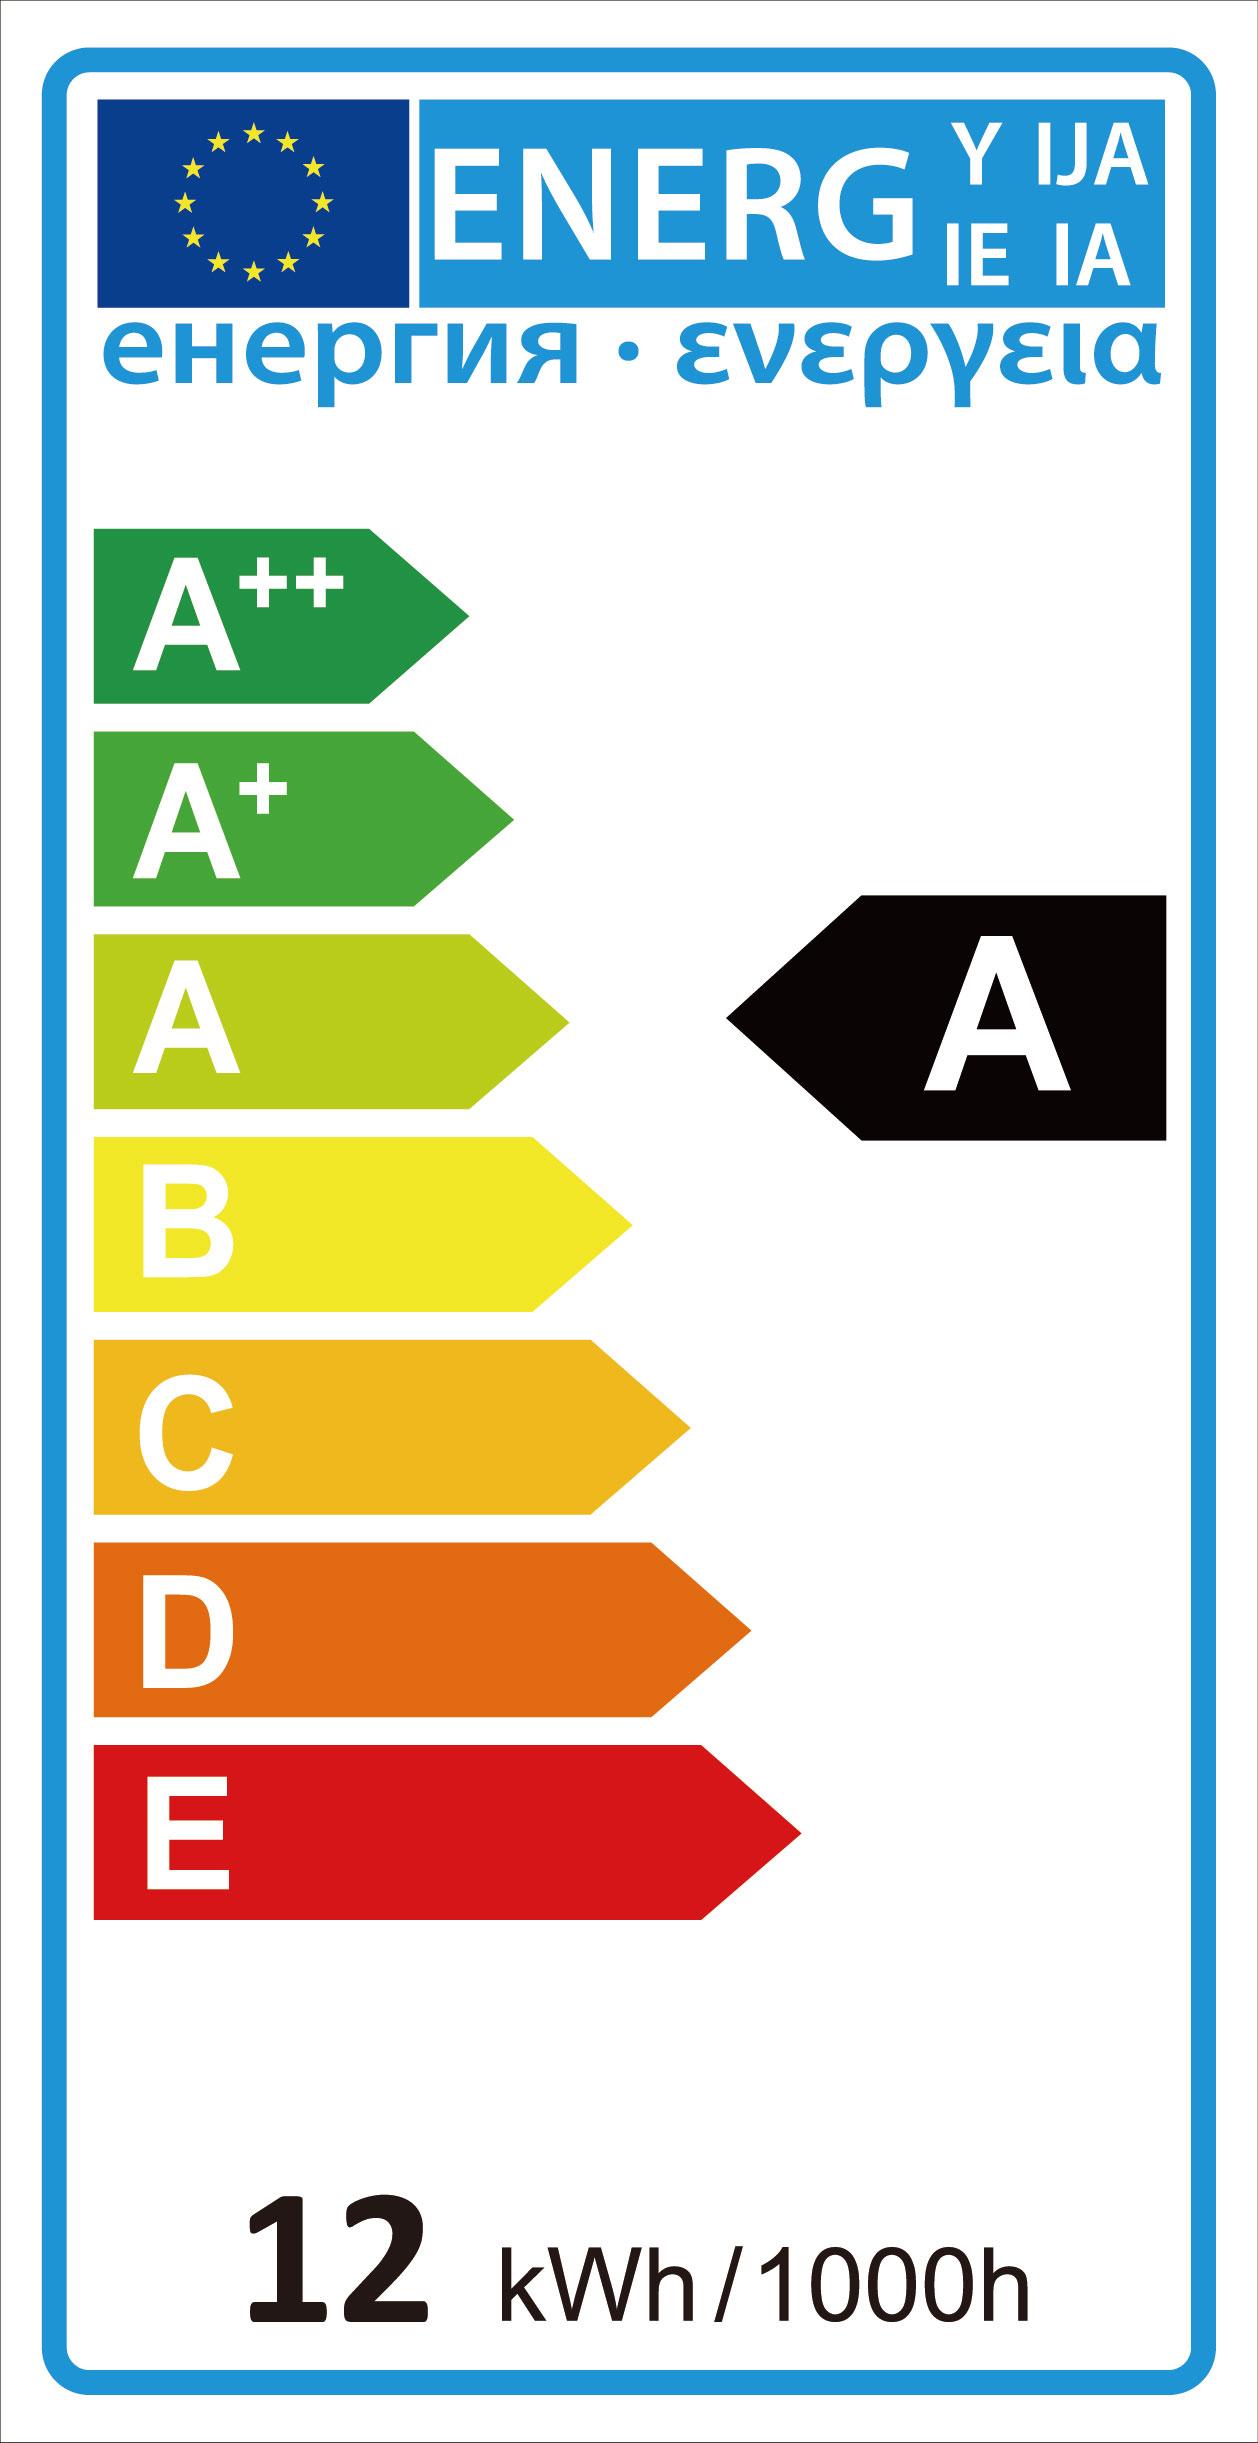 Label of Efficiency Energy in LED Lighting